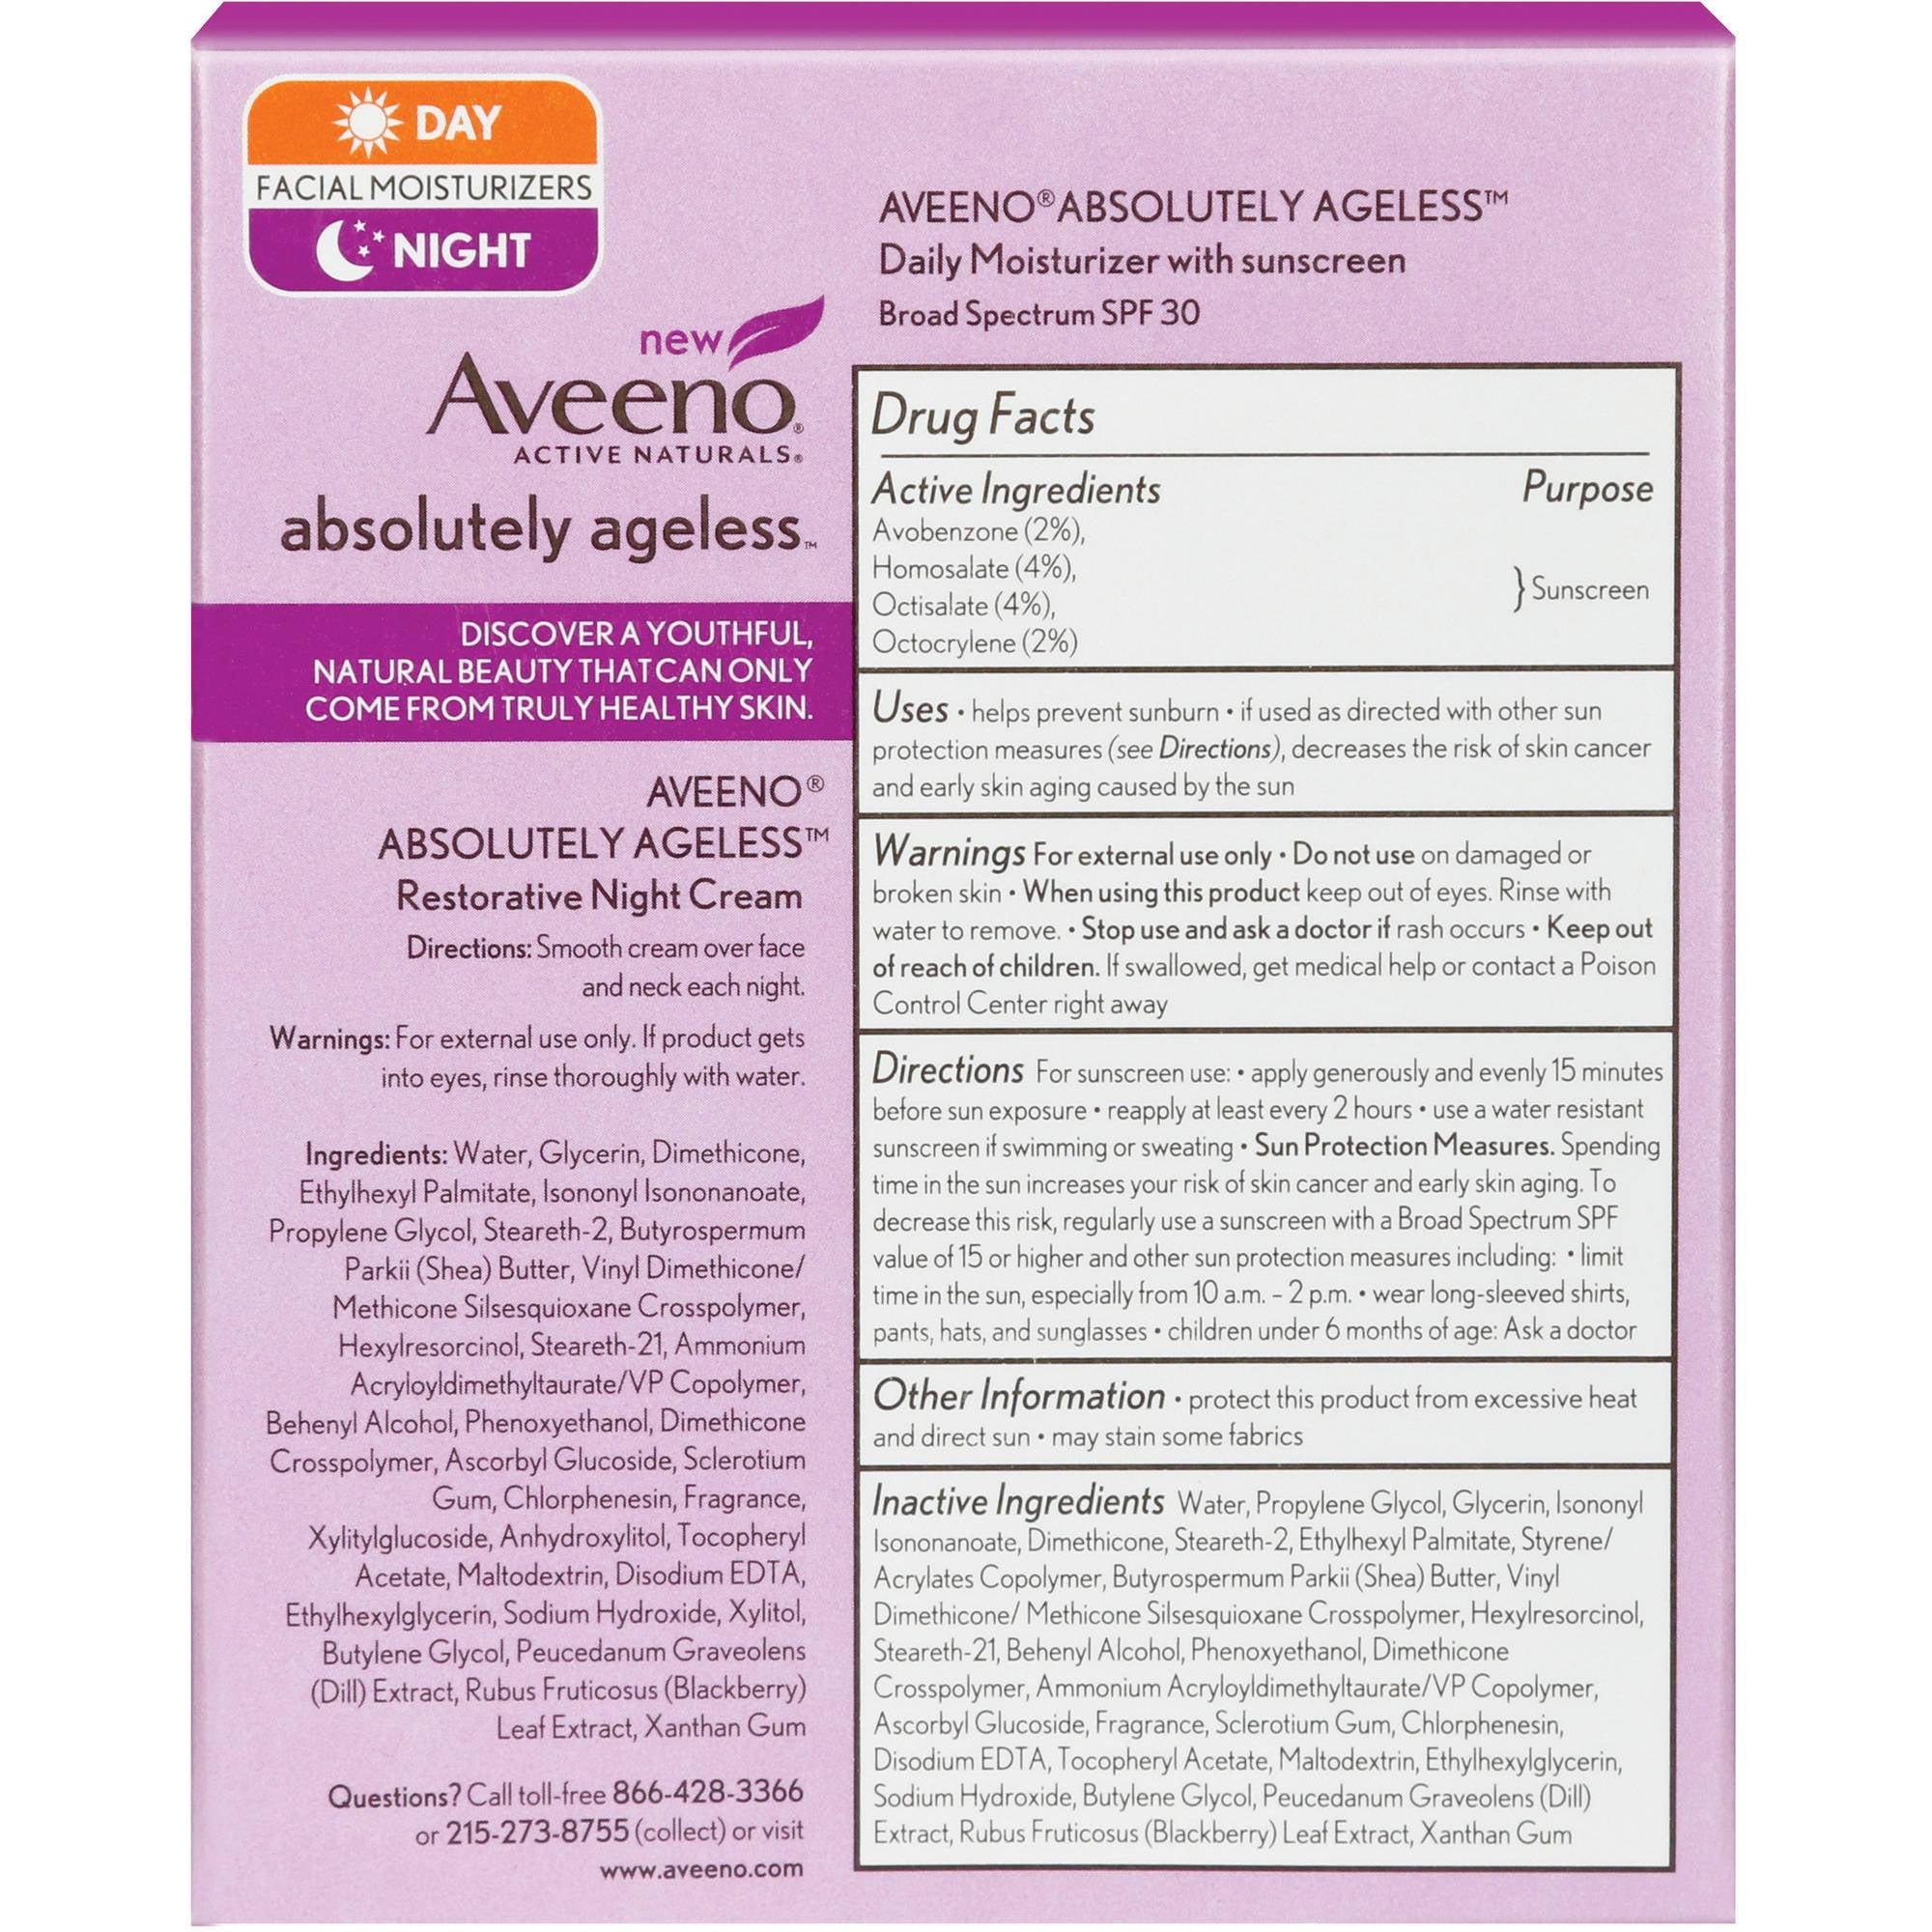 Aveeno Absolutely Ageless Facial Care Starter Kit, 2 pc 3 Pack Palmers Cocoa Butter EVENTONE FADE CREAM Dark Spot Corrector 2.7oz Each